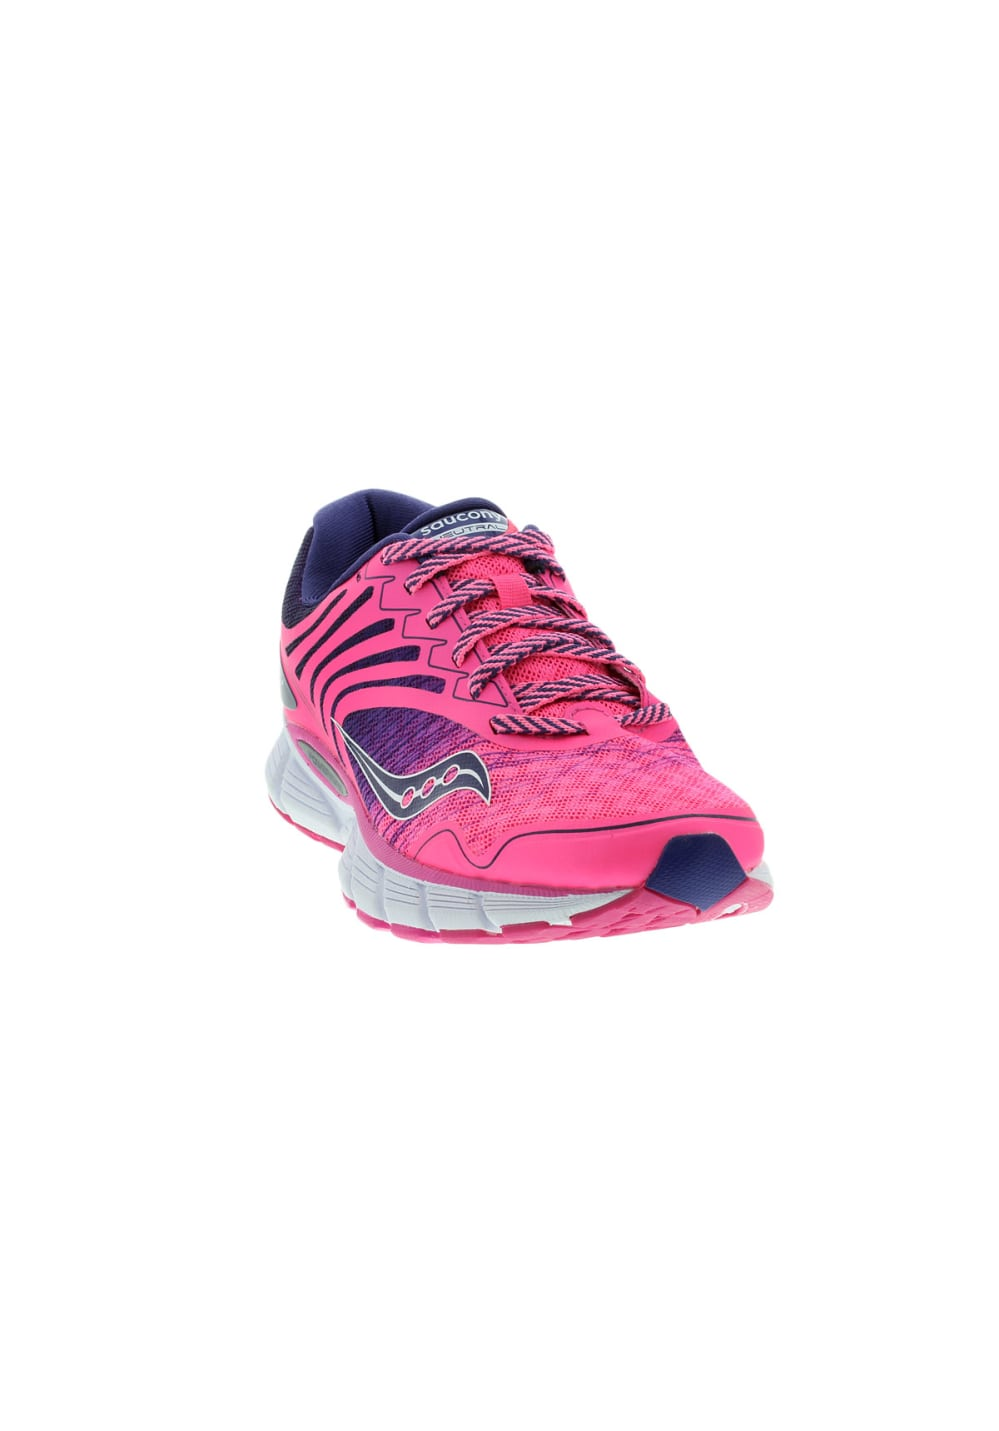 Womens Running Shoes Pink Saucony Breakthru 2 Running